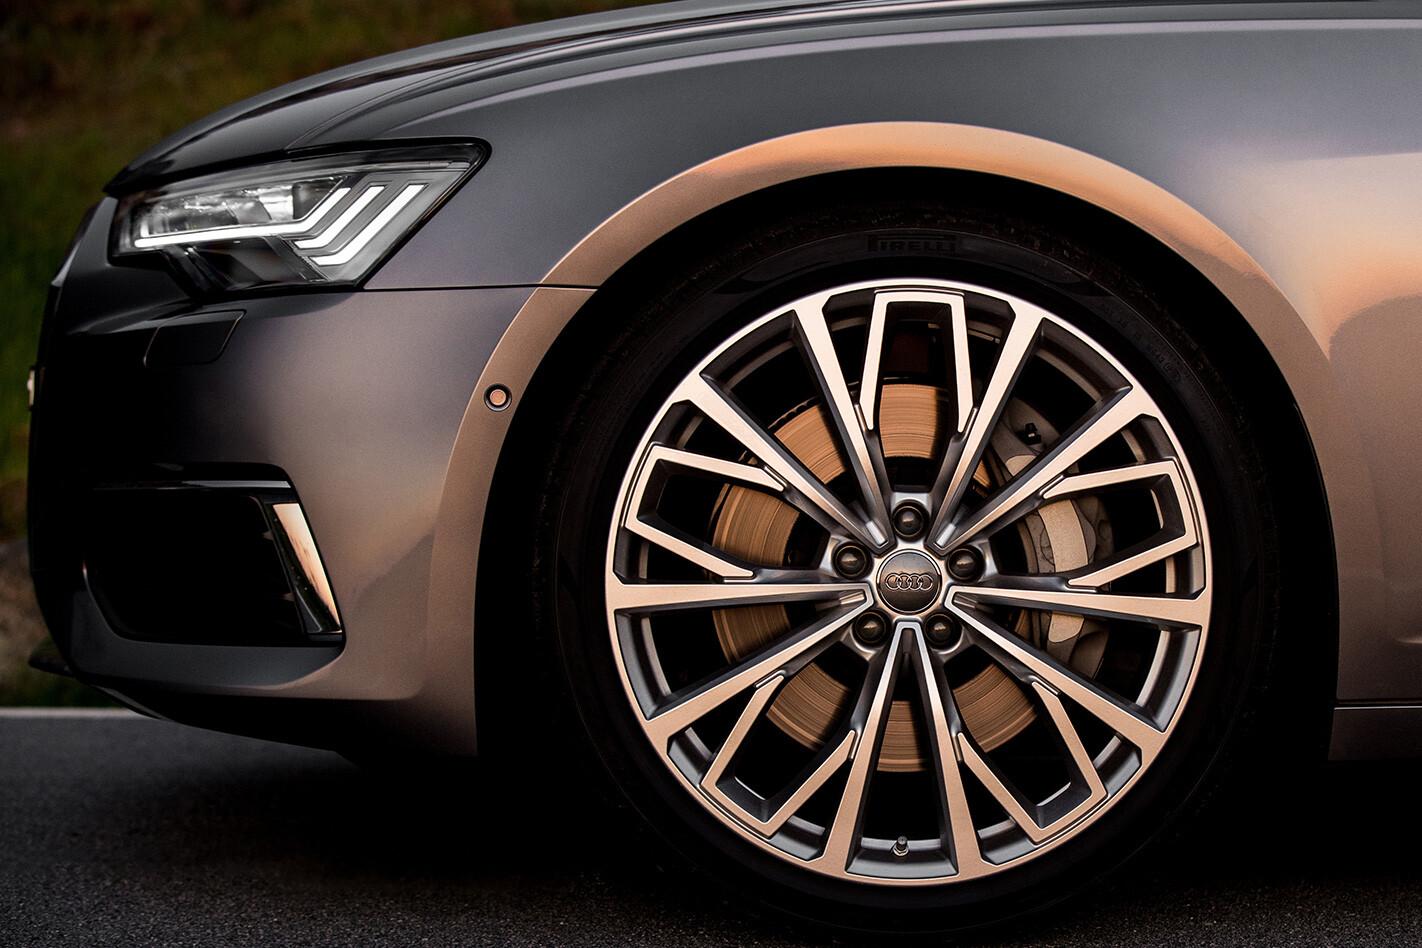 Audi A 6 Wheel Jpg